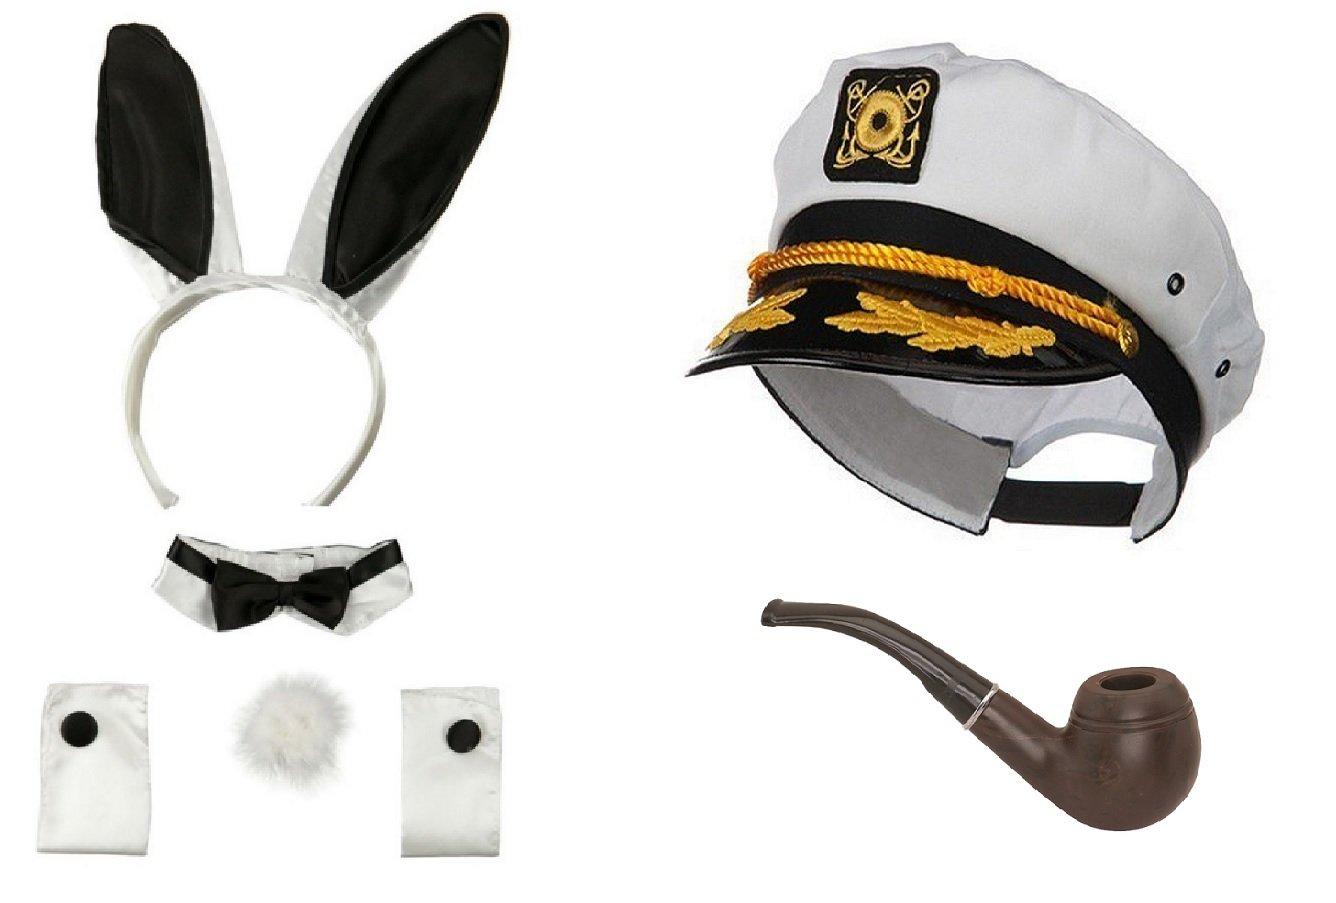 Nicky Bigs Novelties Sailor Ship Yacht Captain Hat Smoking Pipe Playboy Bunny Hugh HEFNER Costume Kit